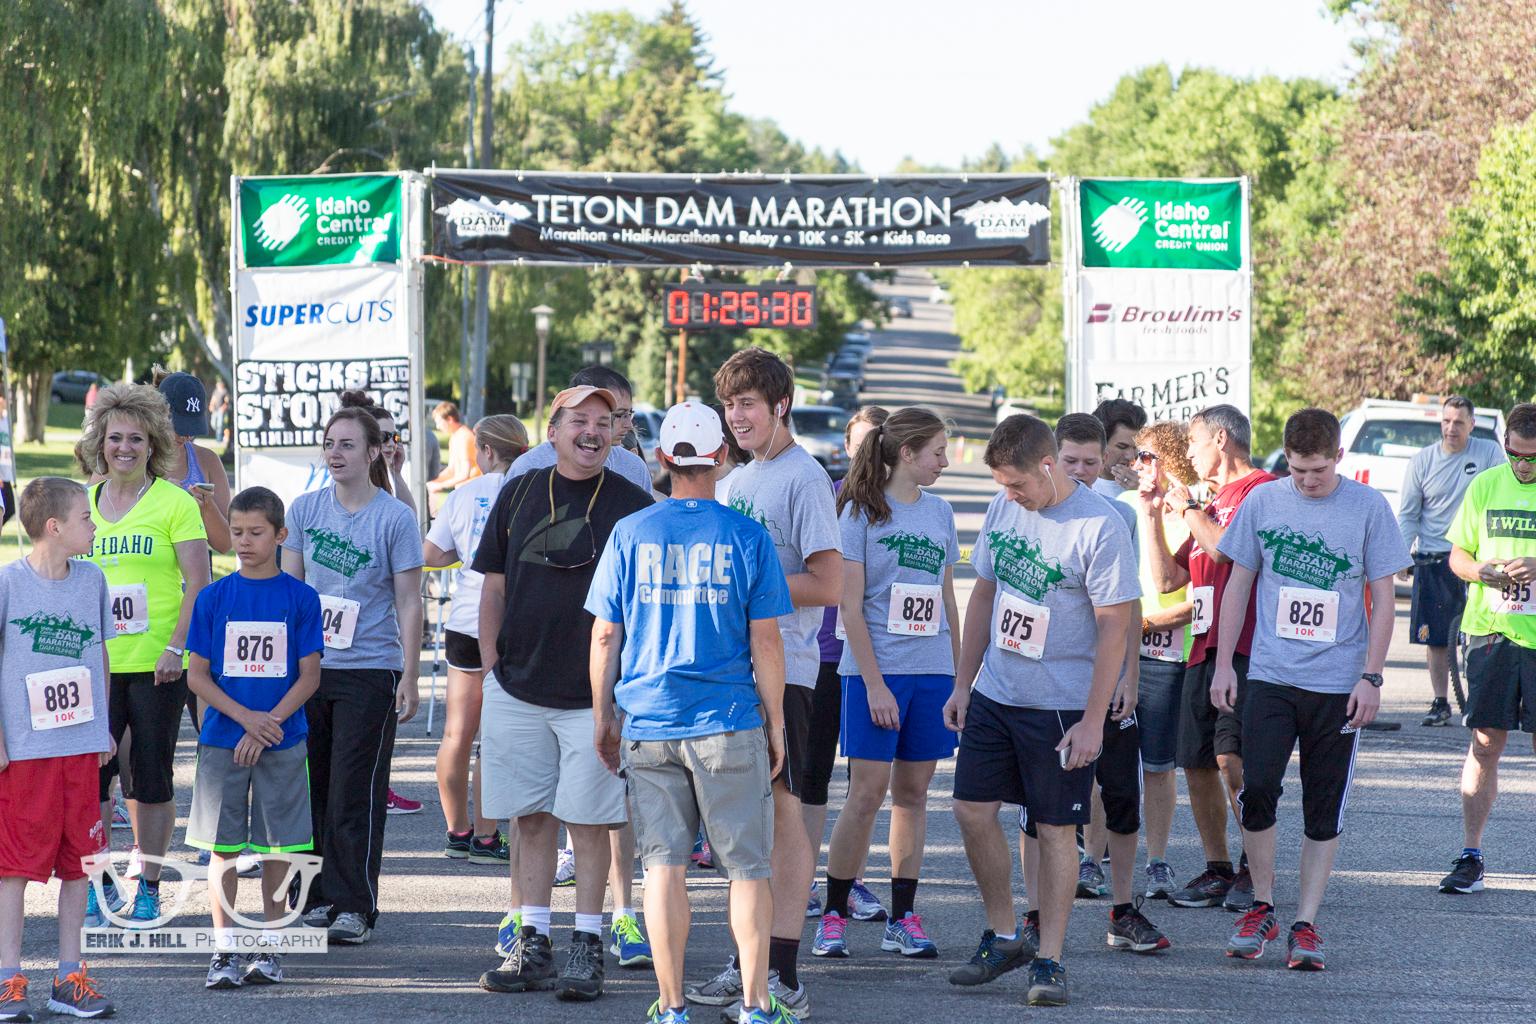 Teton Dam Marathon - Erik J  Hill Photography